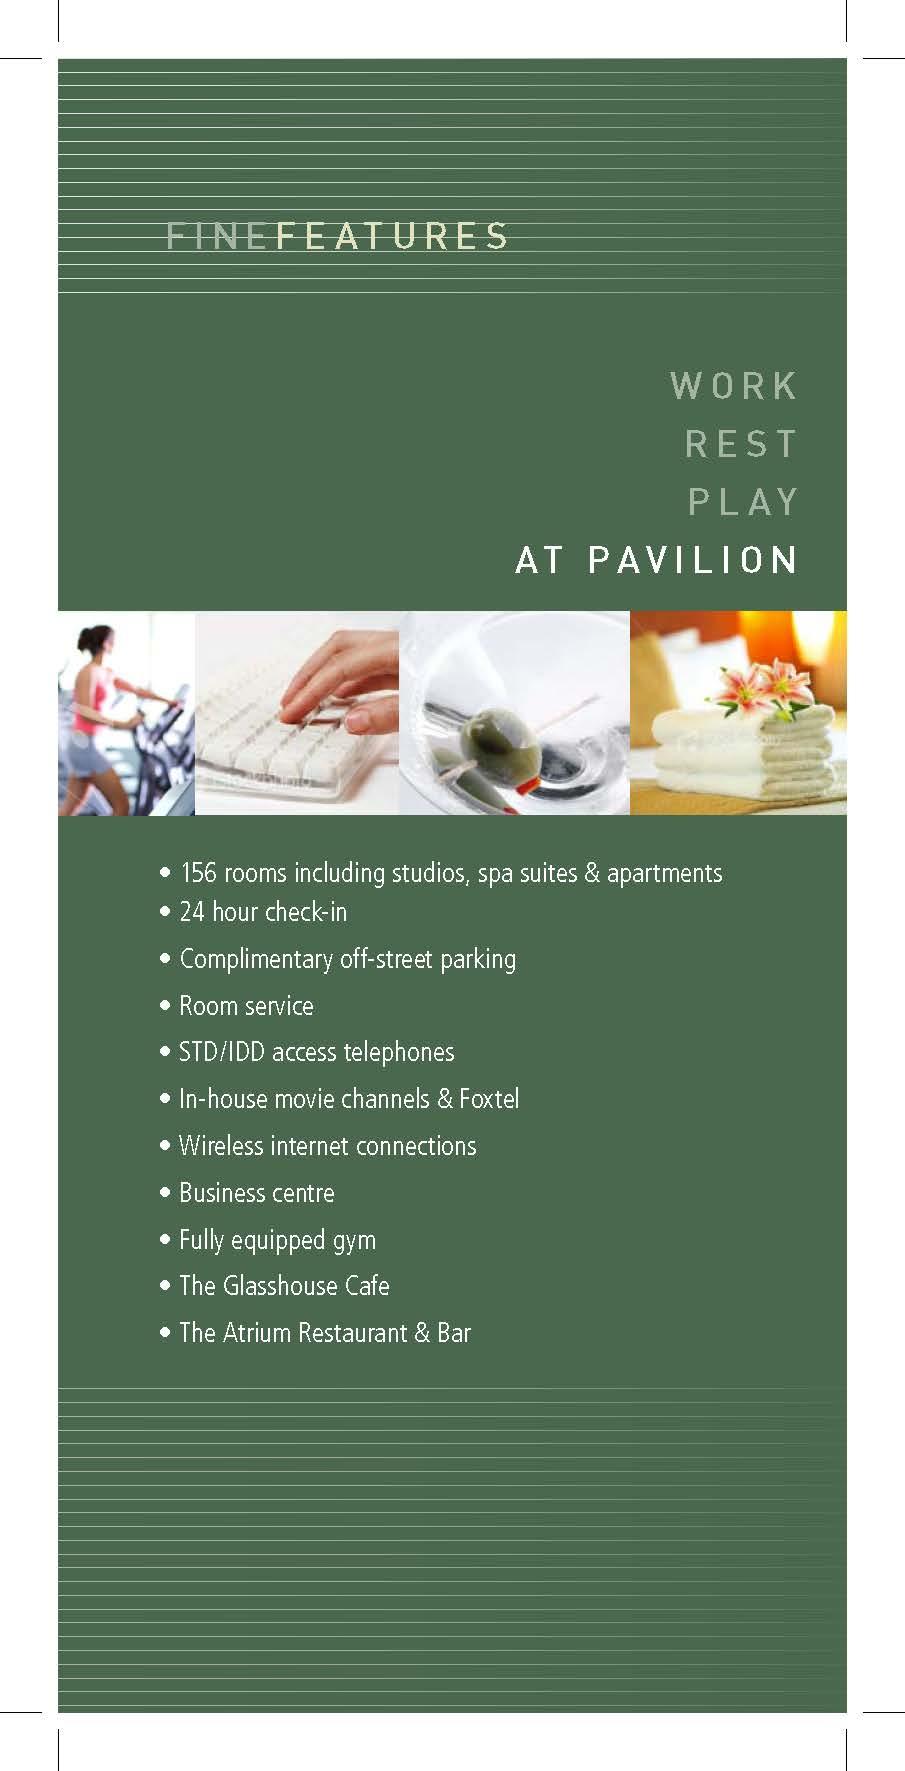 Pavilion DL pamphlet cover_Page_01